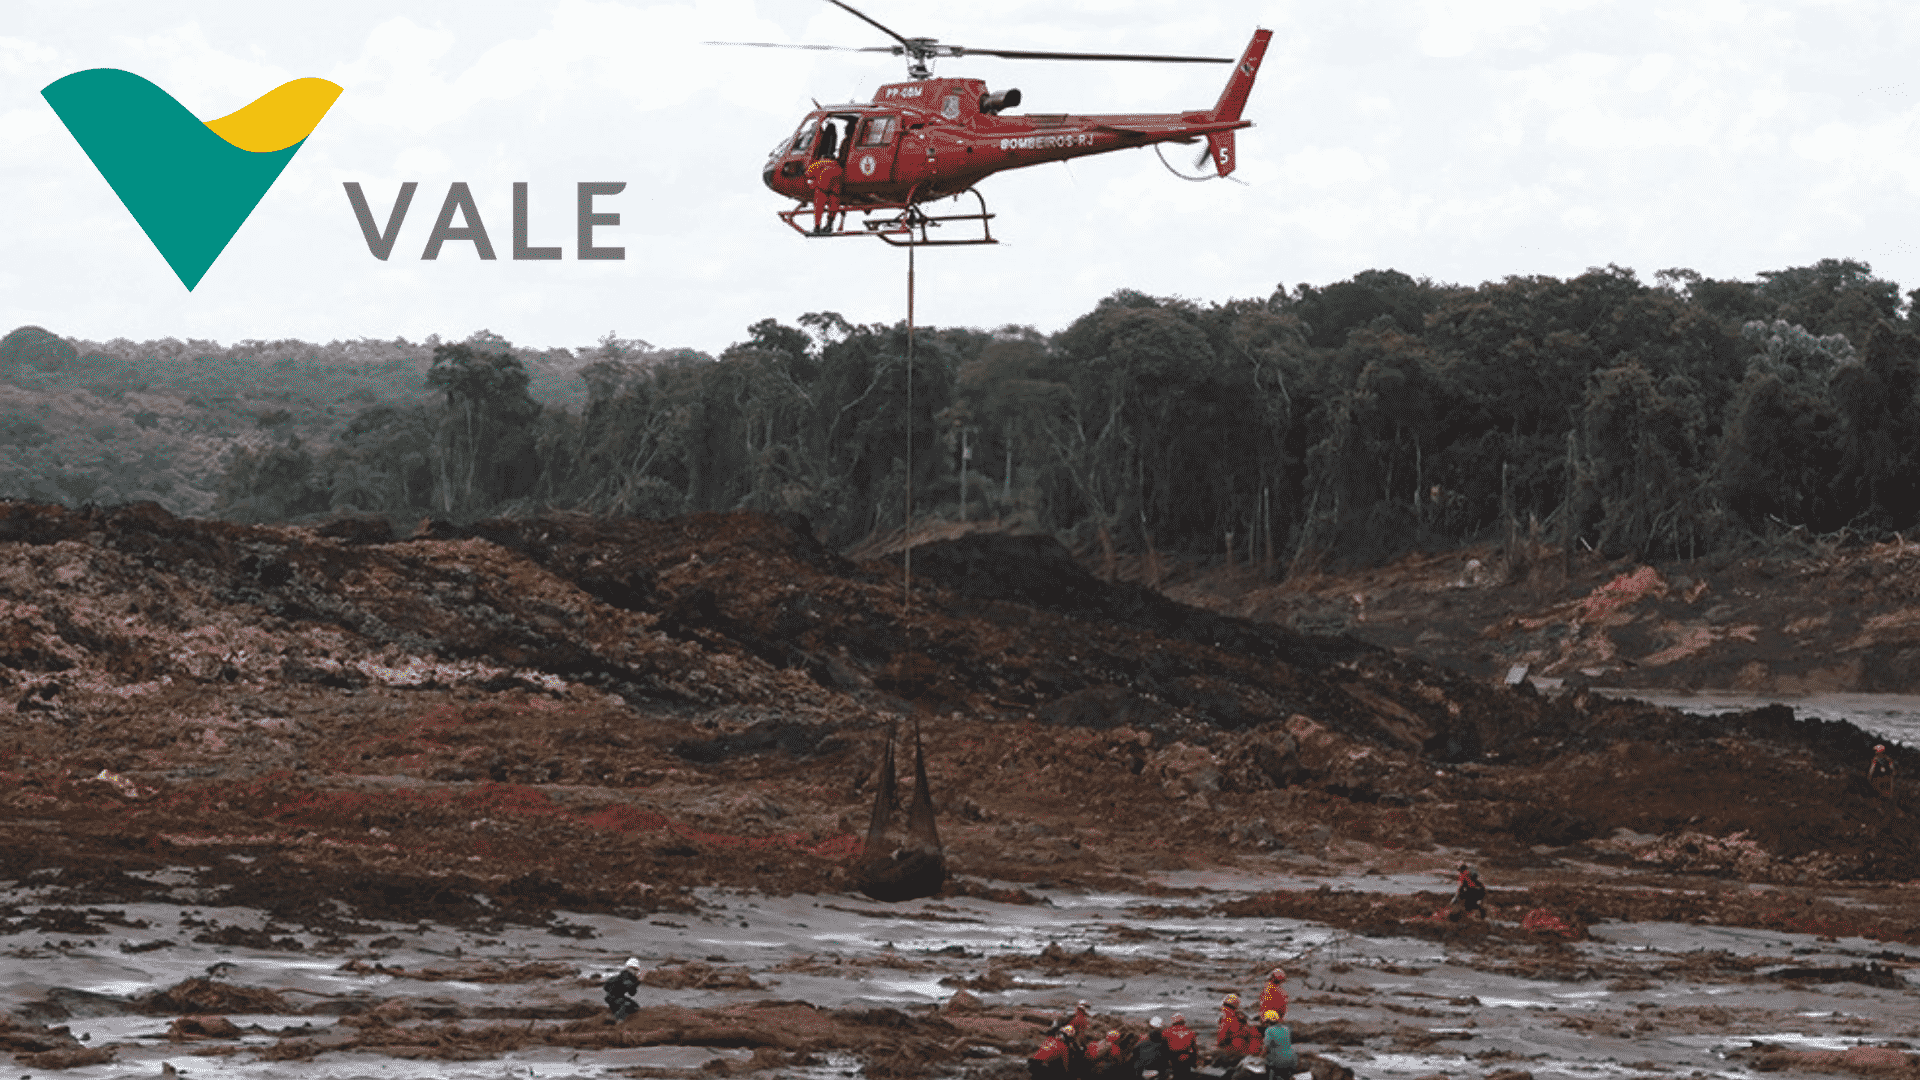 Vale – mineradora – Brumadinho – Minas Gerais